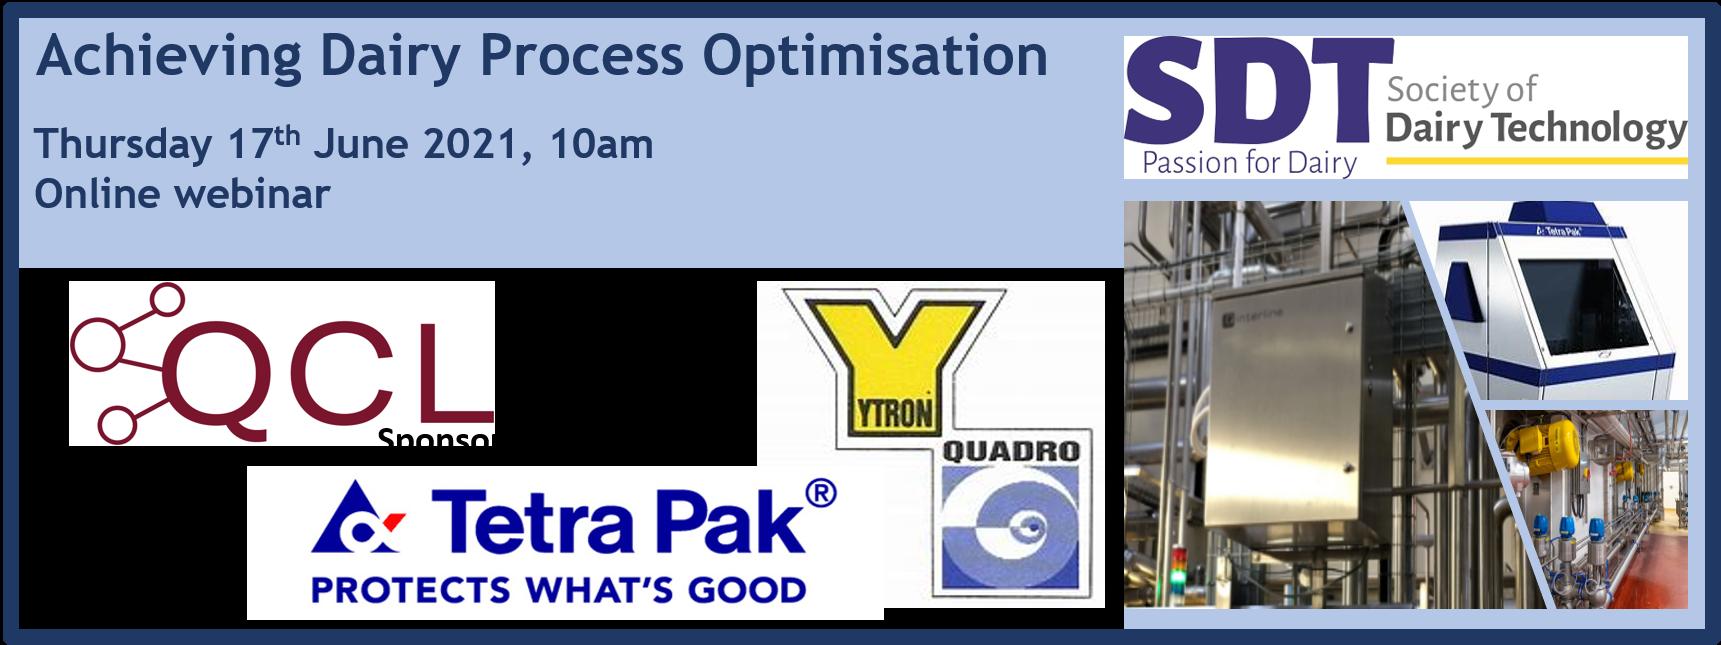 SDT webinar: Achieving Dairy Process Optimisation